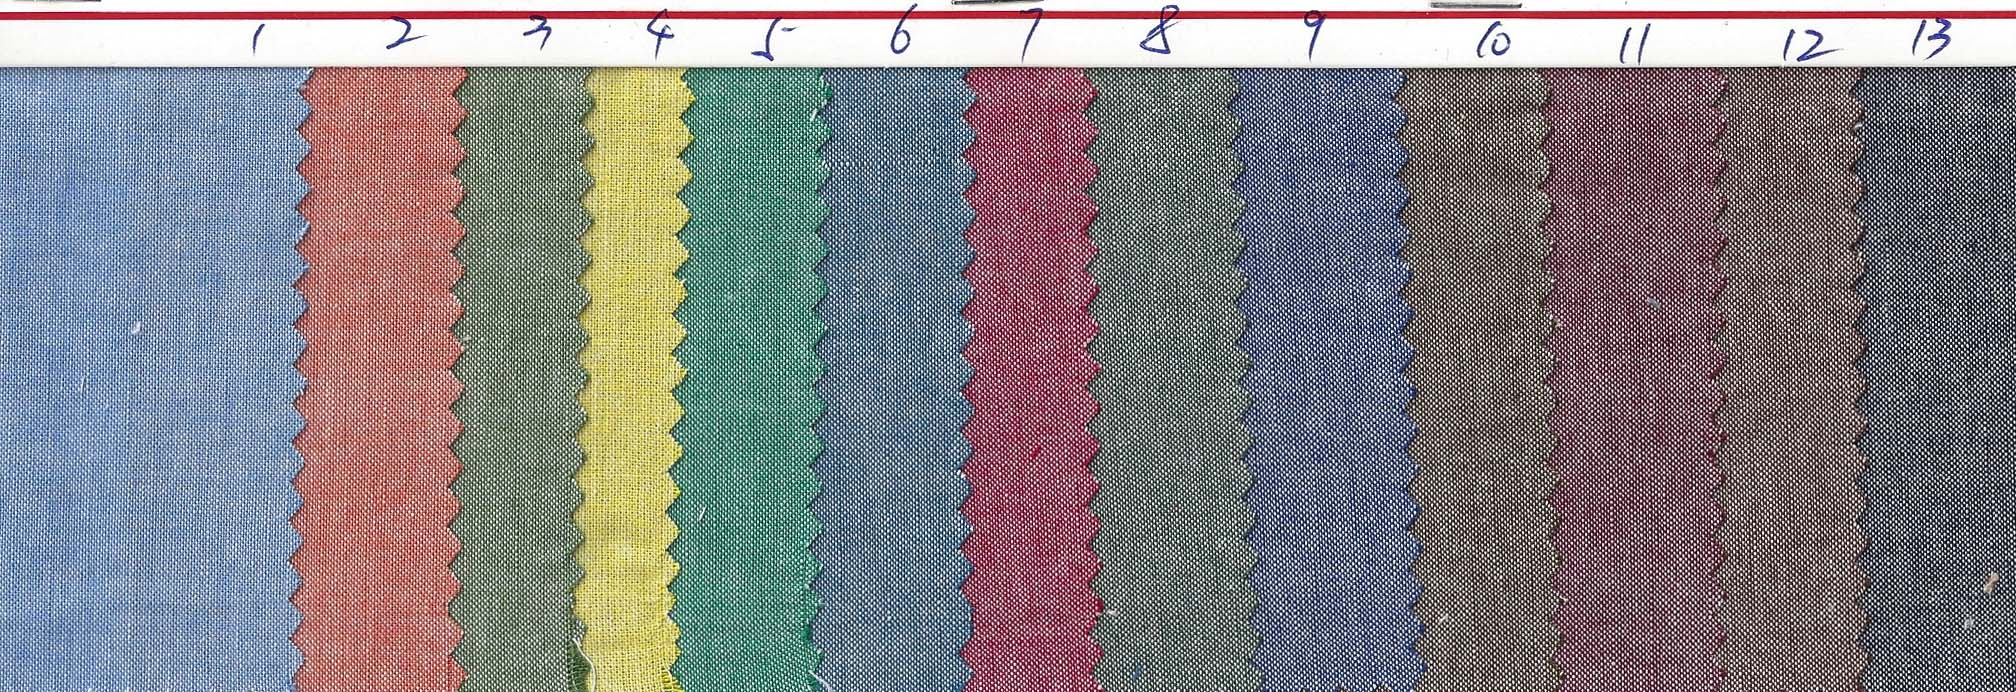 Ge Mei Textile H671.jpg